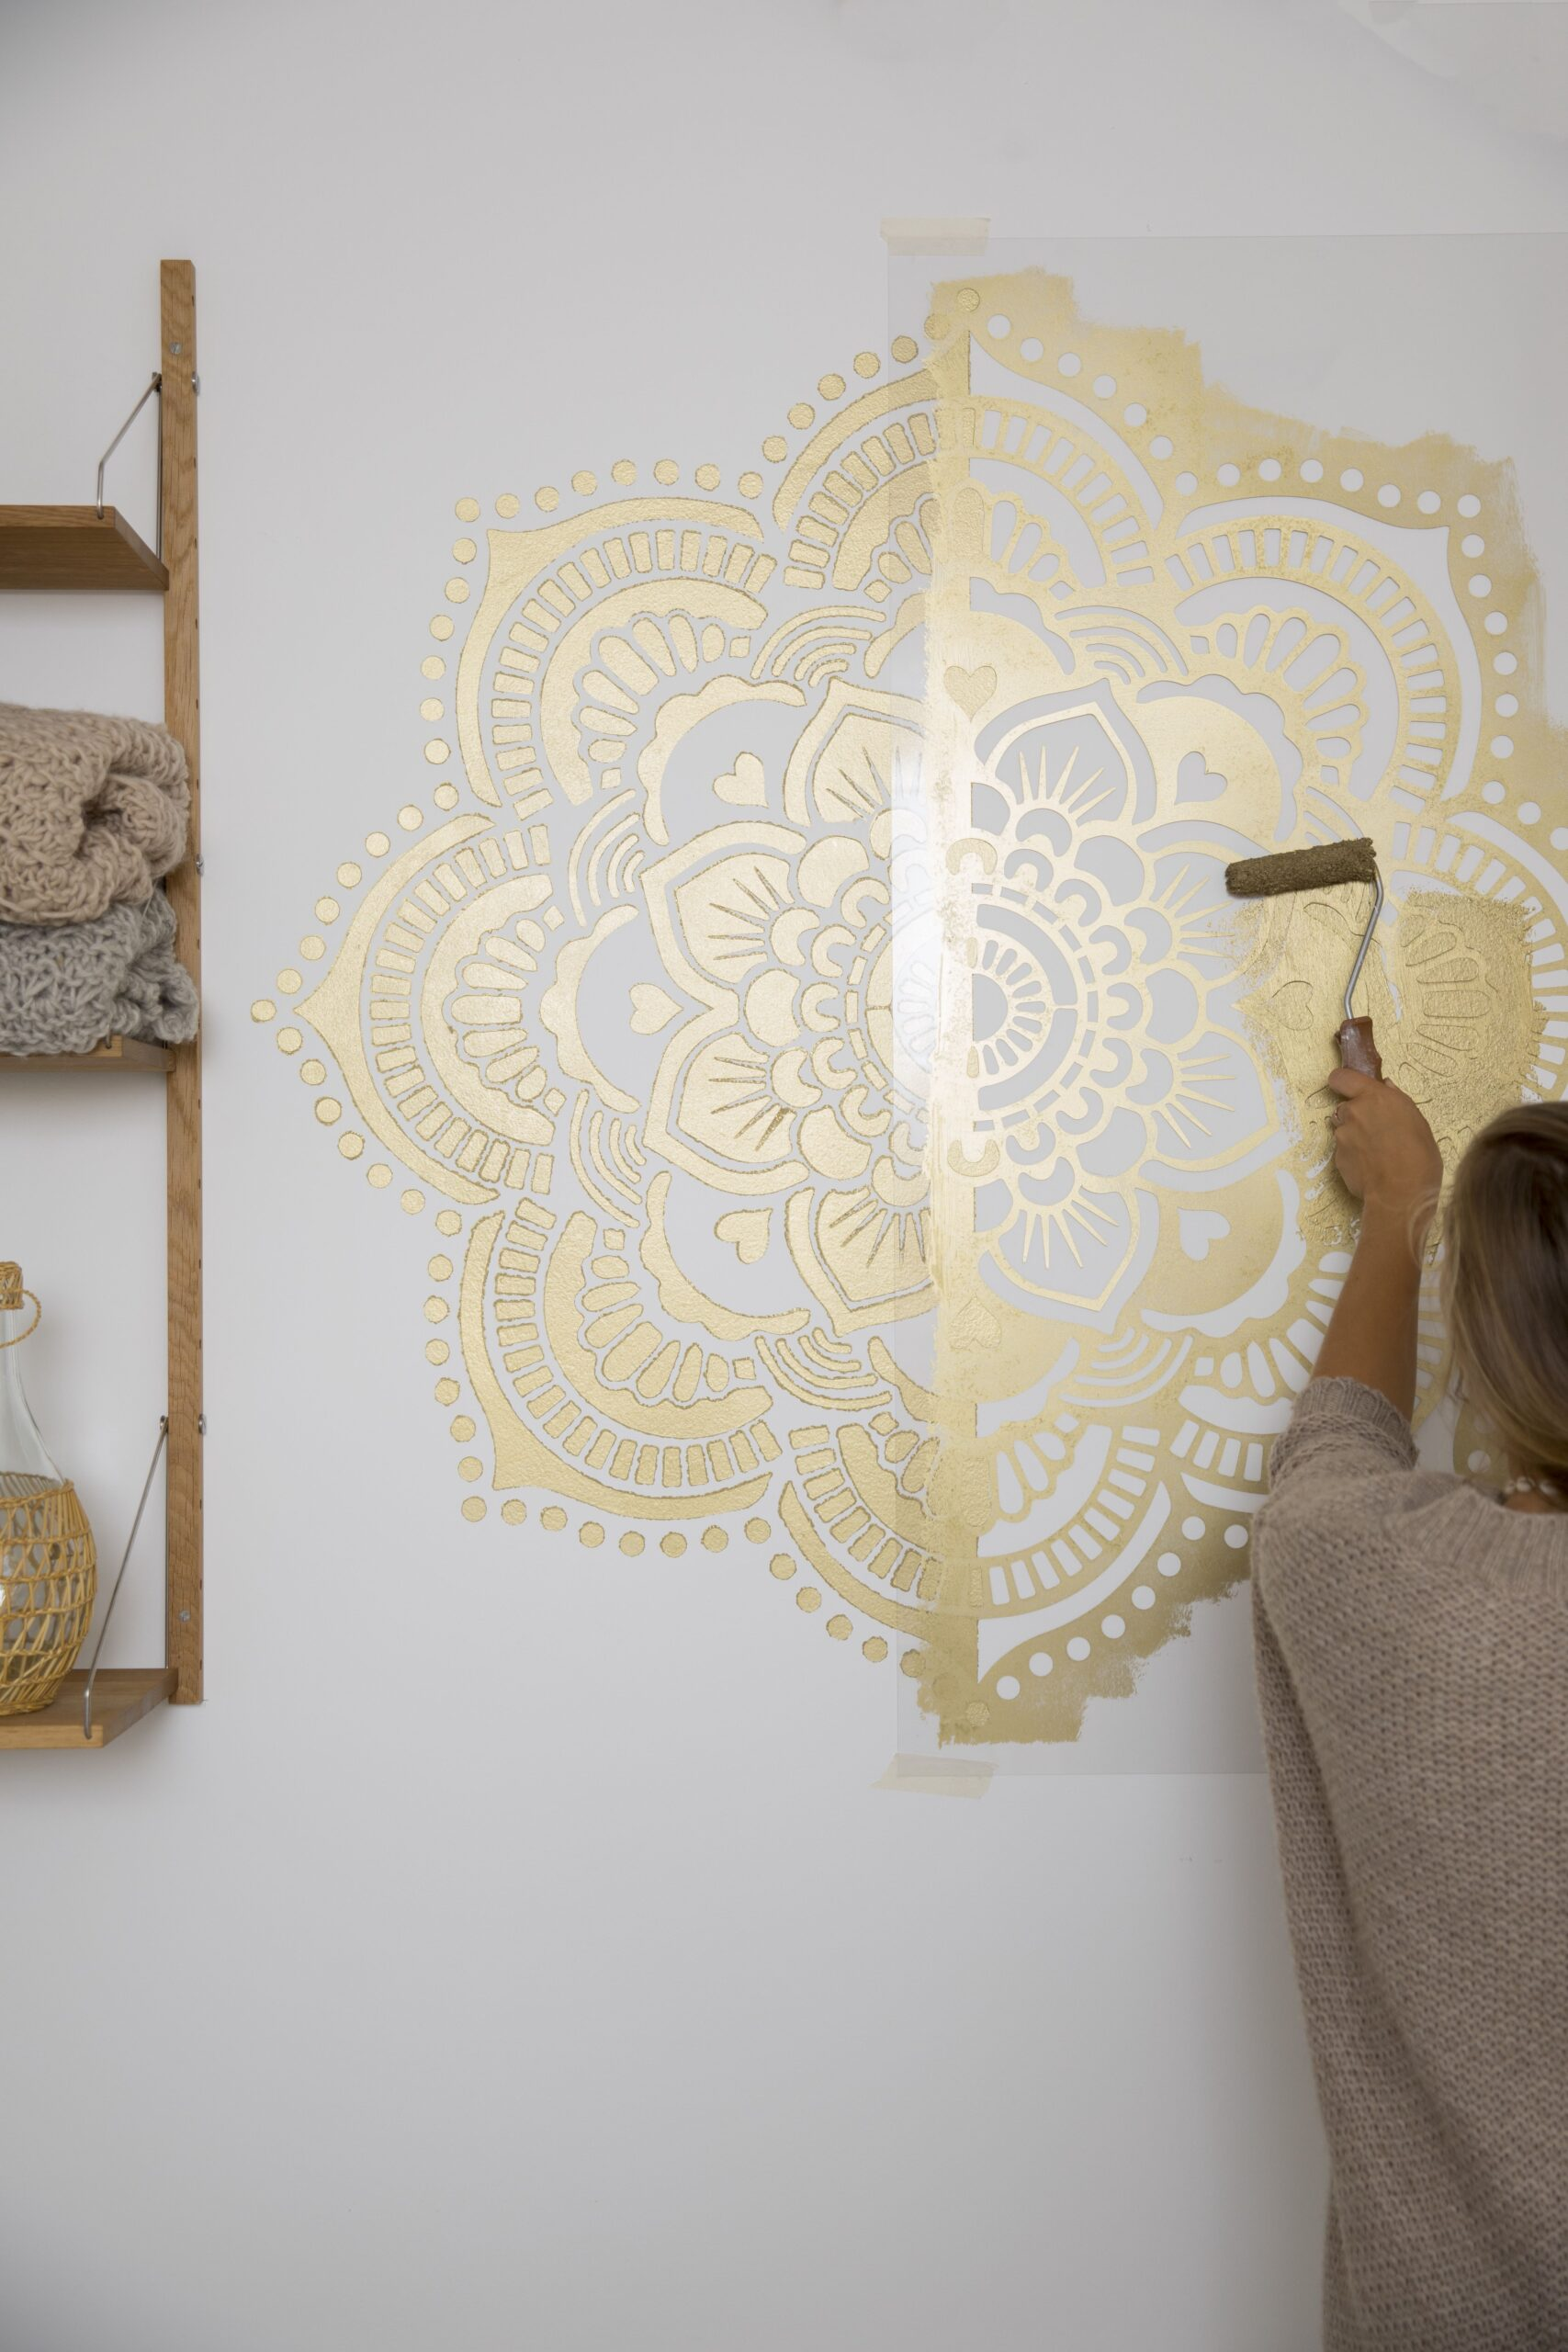 Full Size of Make A Golden Yoga Mandala 118 By Cmstep Step Regal Kinderzimmer Weiß Sofa Regale Kinderzimmer Wandschablonen Kinderzimmer